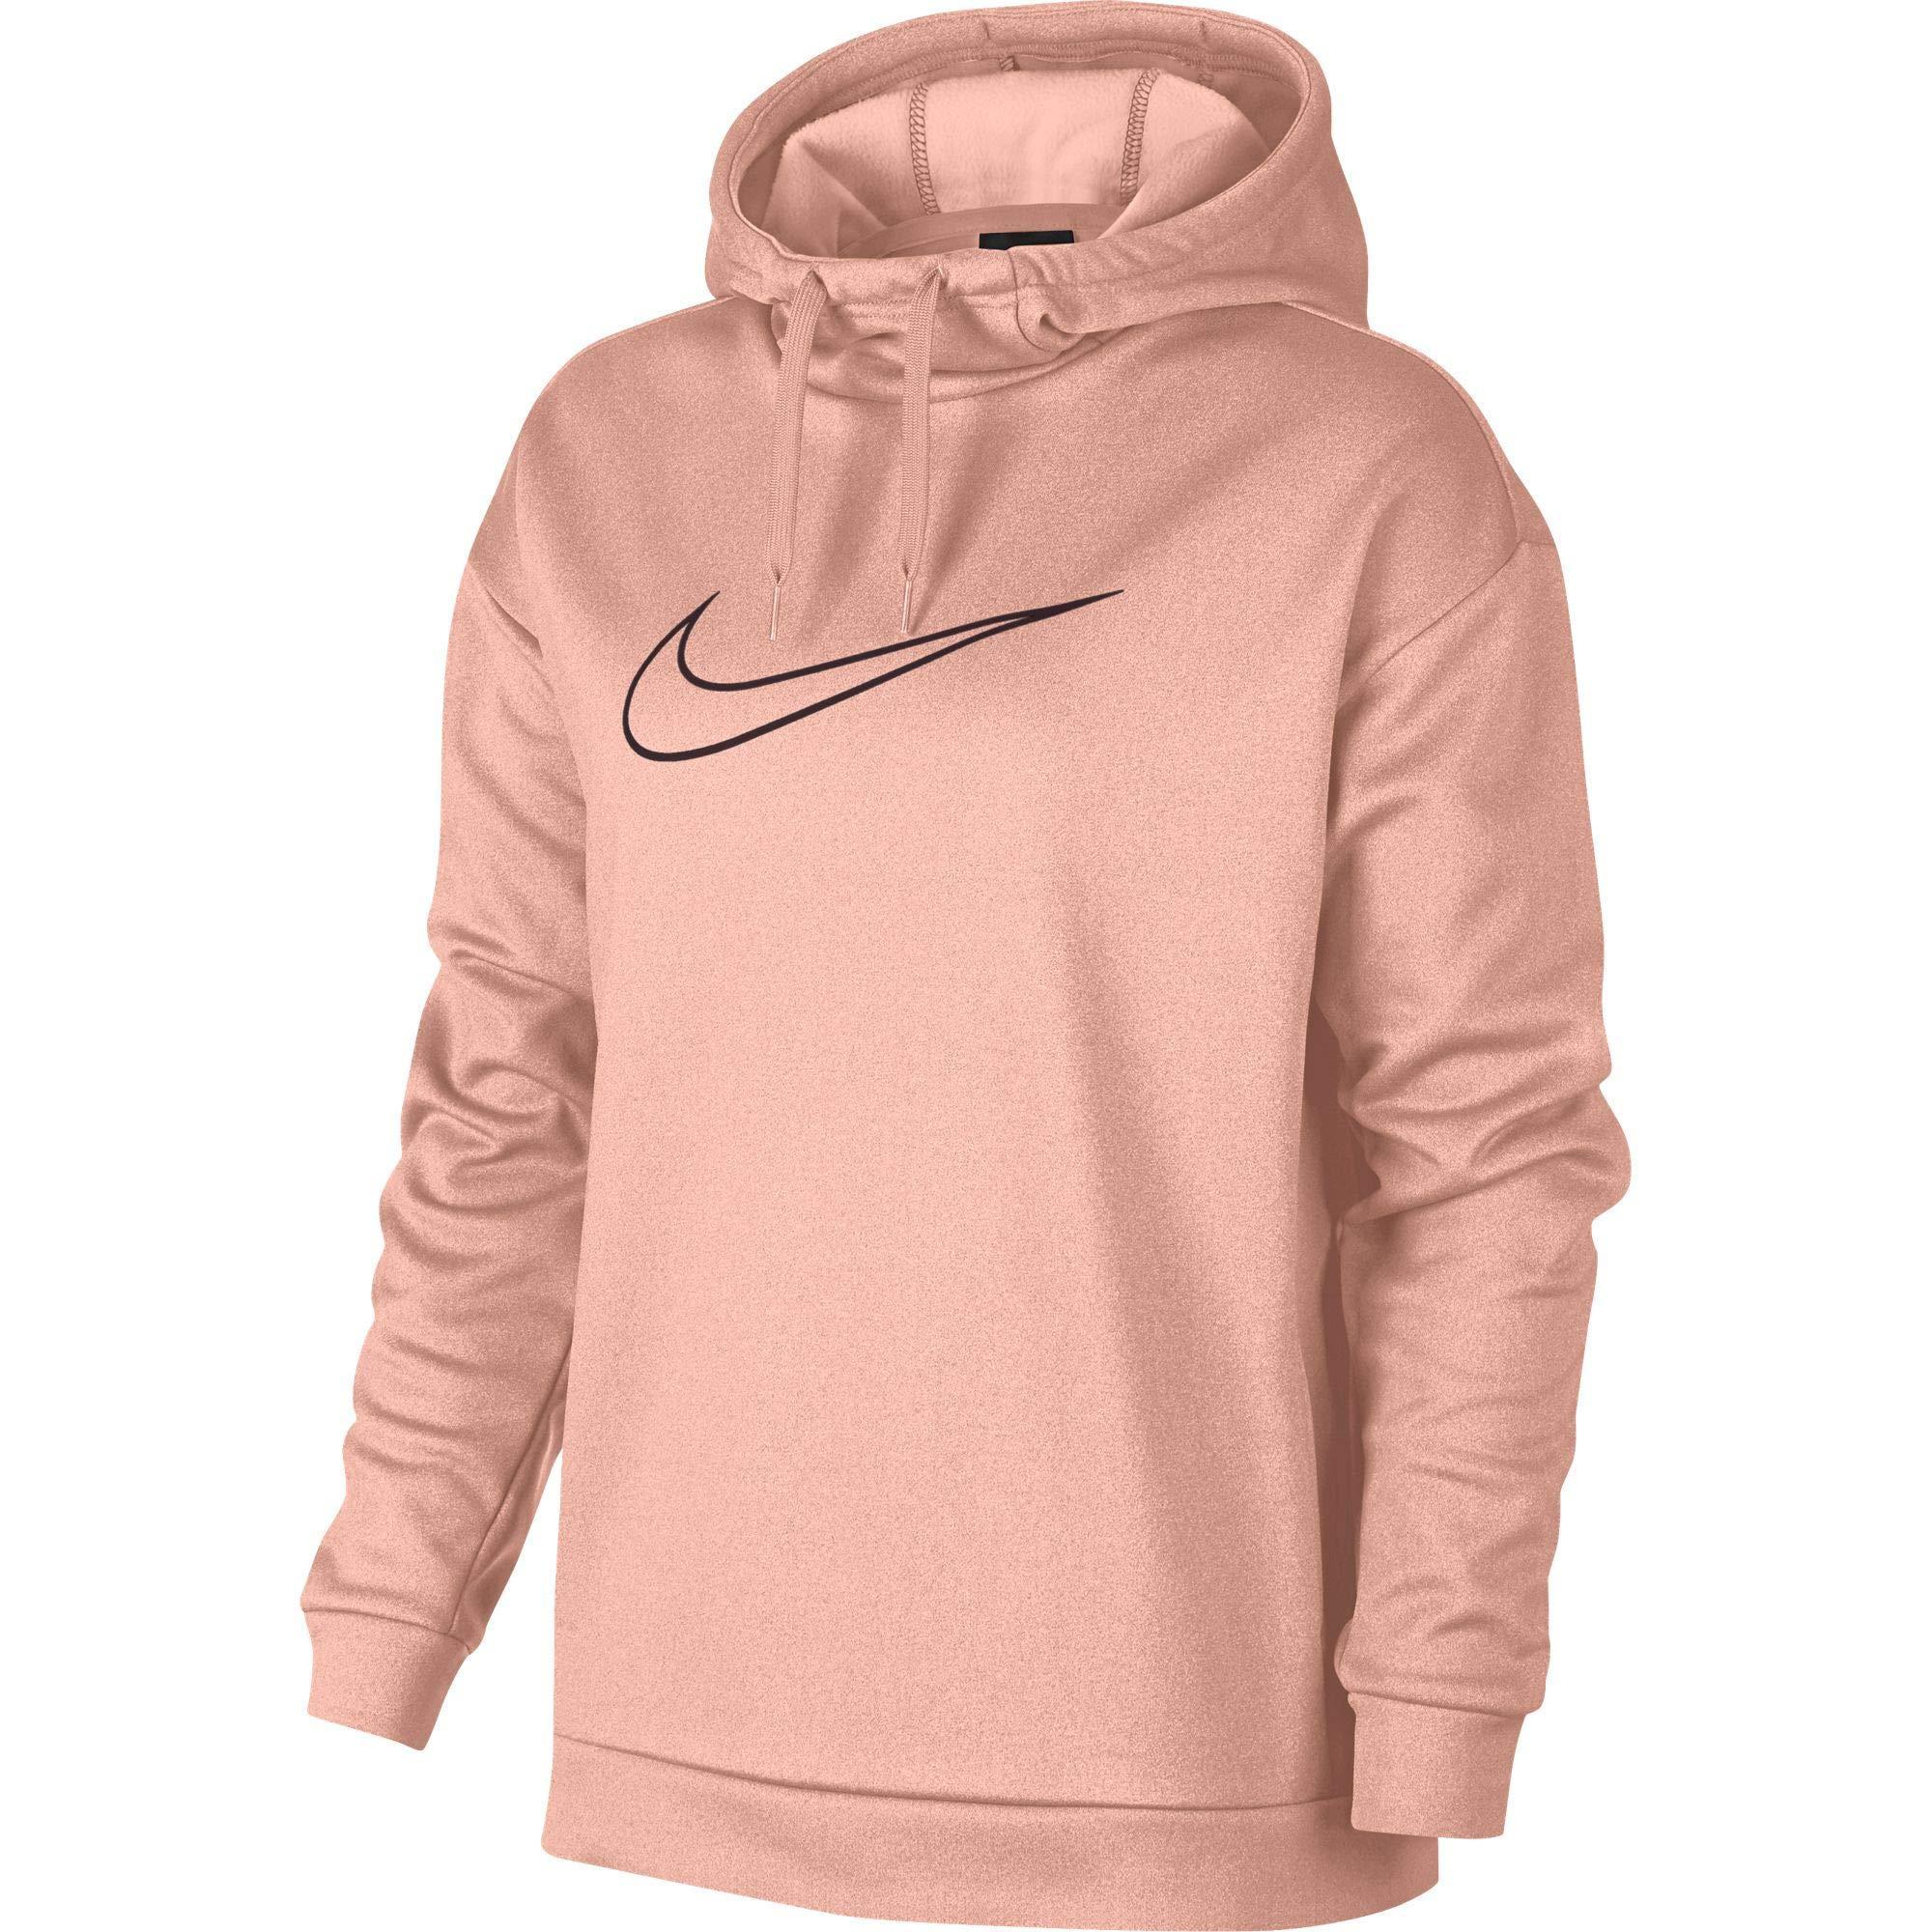 Nike Women's Therma Swoosh Fleece Training Hoodie Storm Pink/Burgundy Crush Size Medium